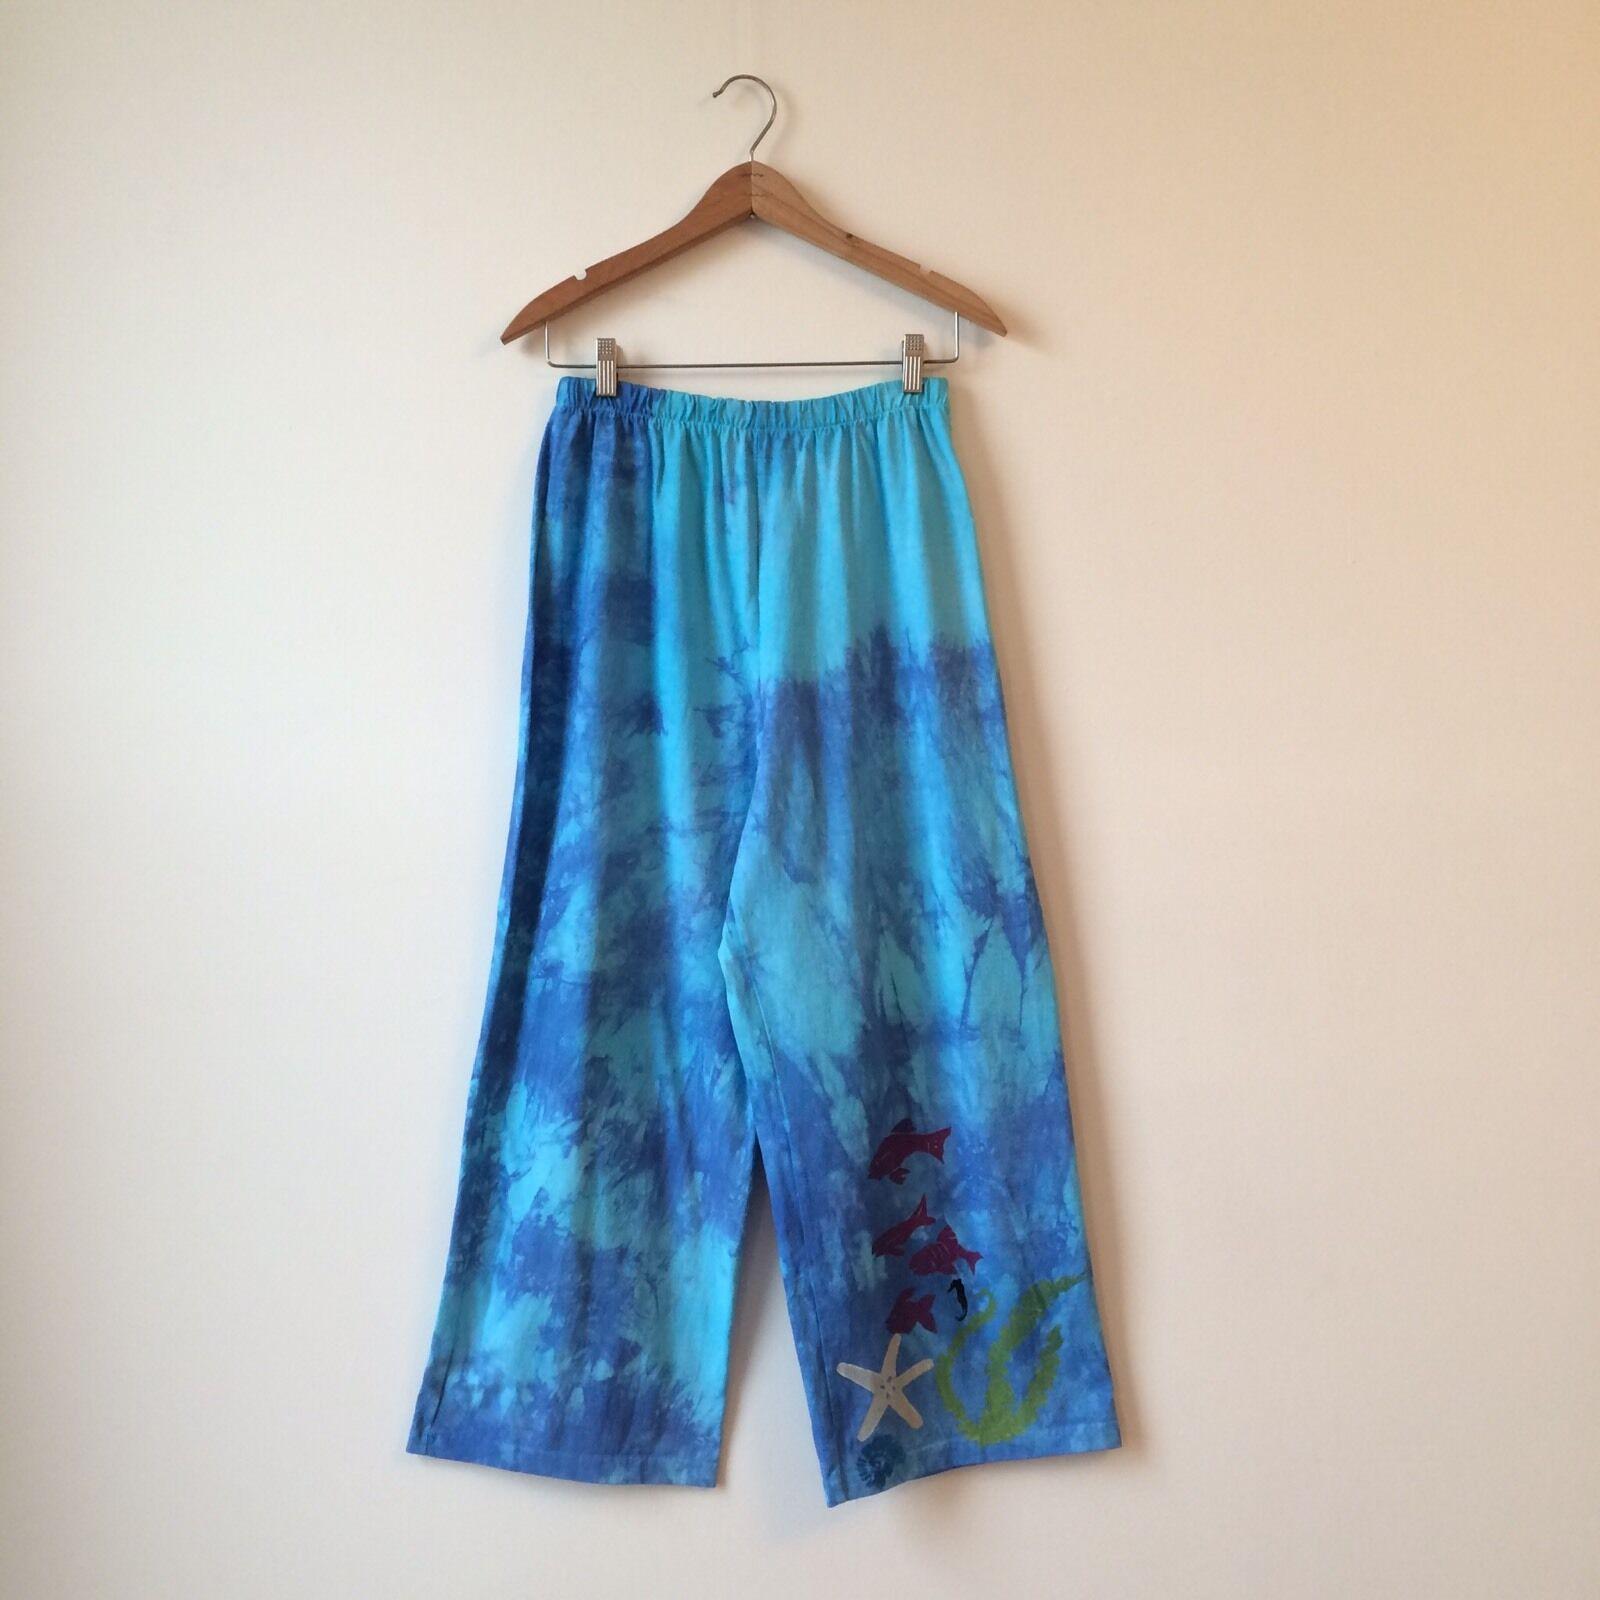 Bread by Staley Gretzinger 100% Cotton Tie Dyed Fish Printed Knit Pants Sz 1 EUC